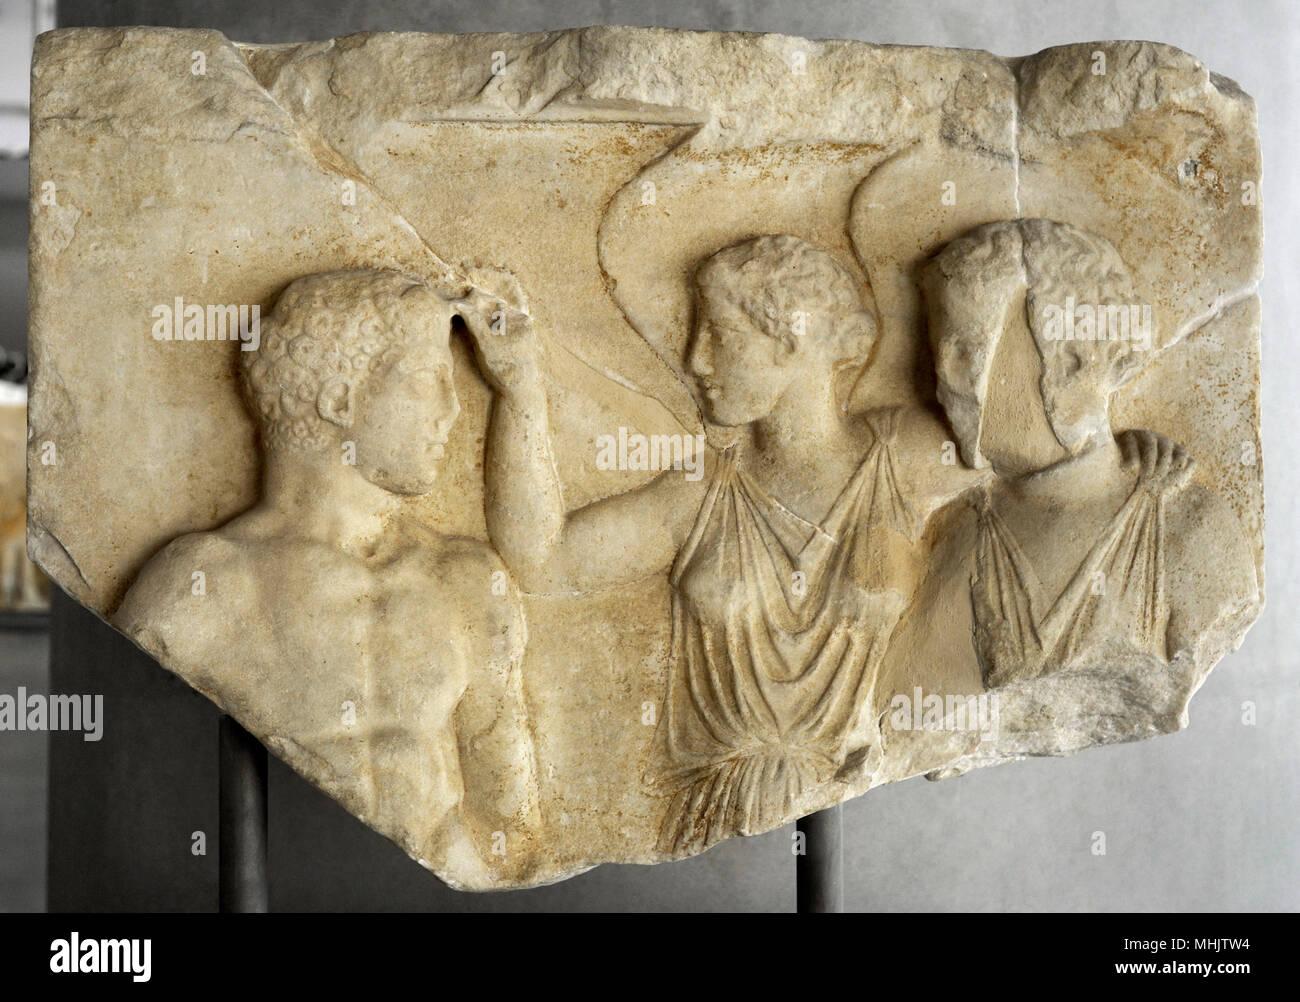 Goddess Relief De Nike Imágenes Stockamp; Of N8wn0mv